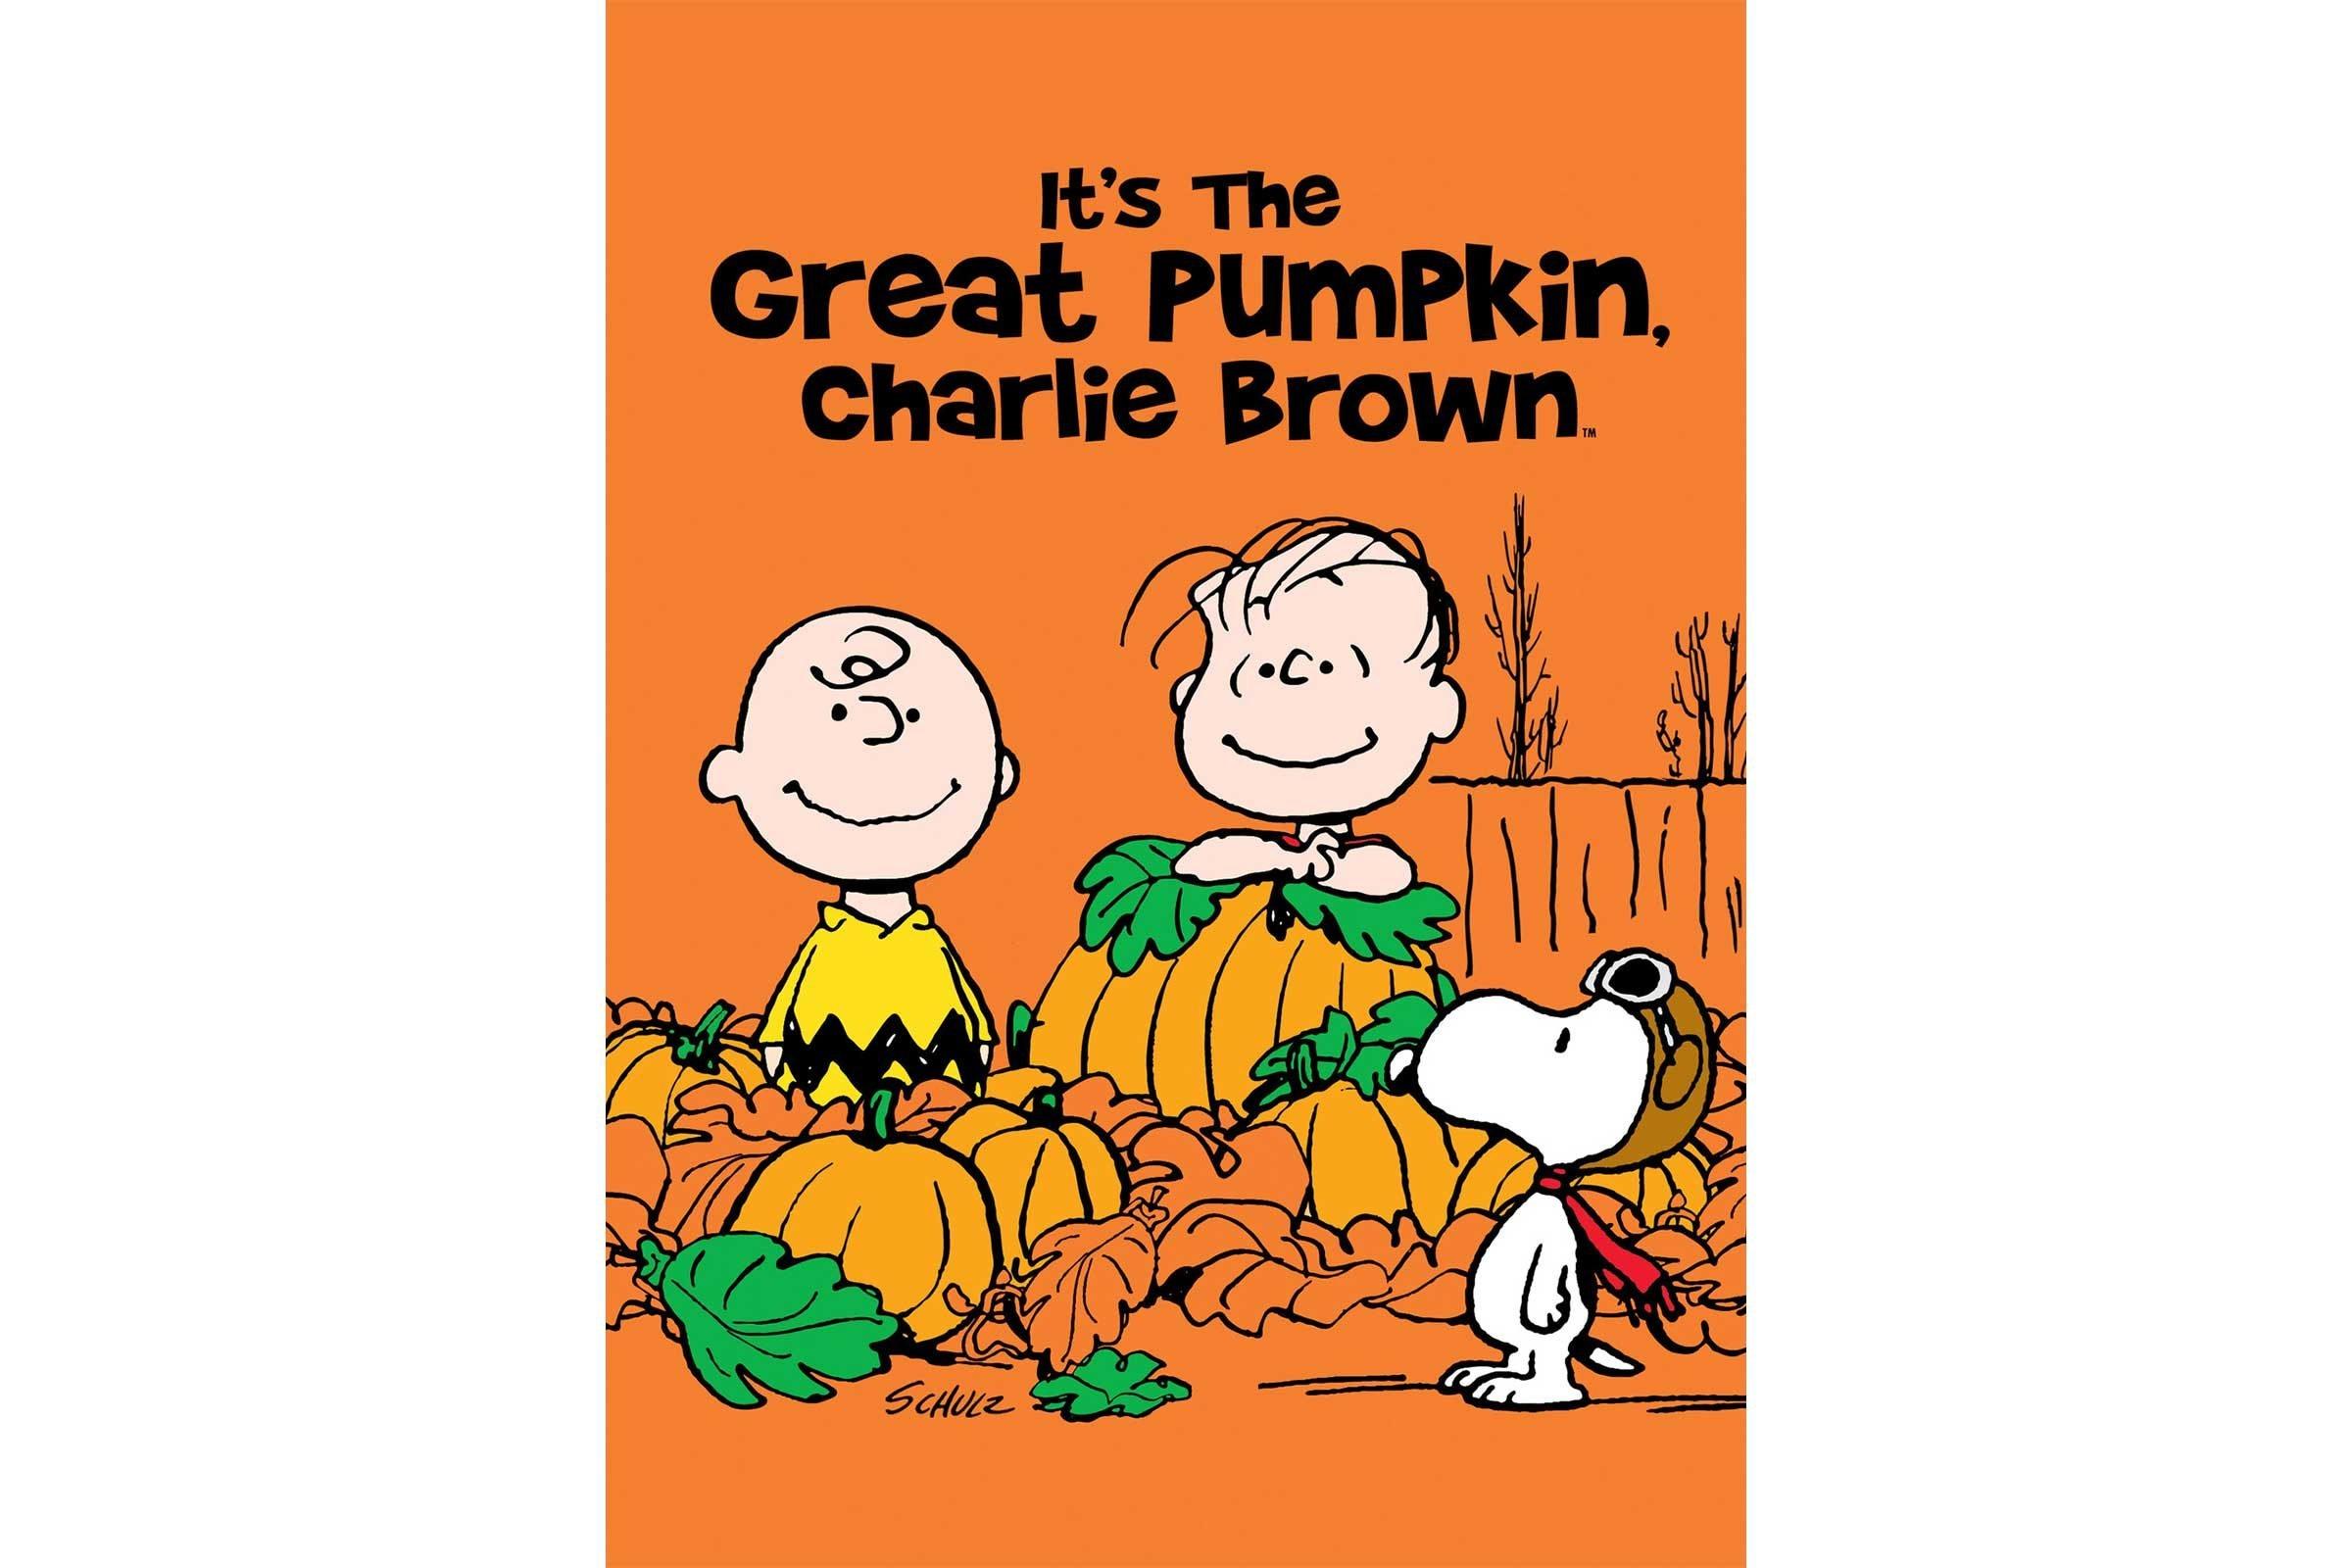 its the great pumpkin charlie brown - Top Halloween Kids Movies